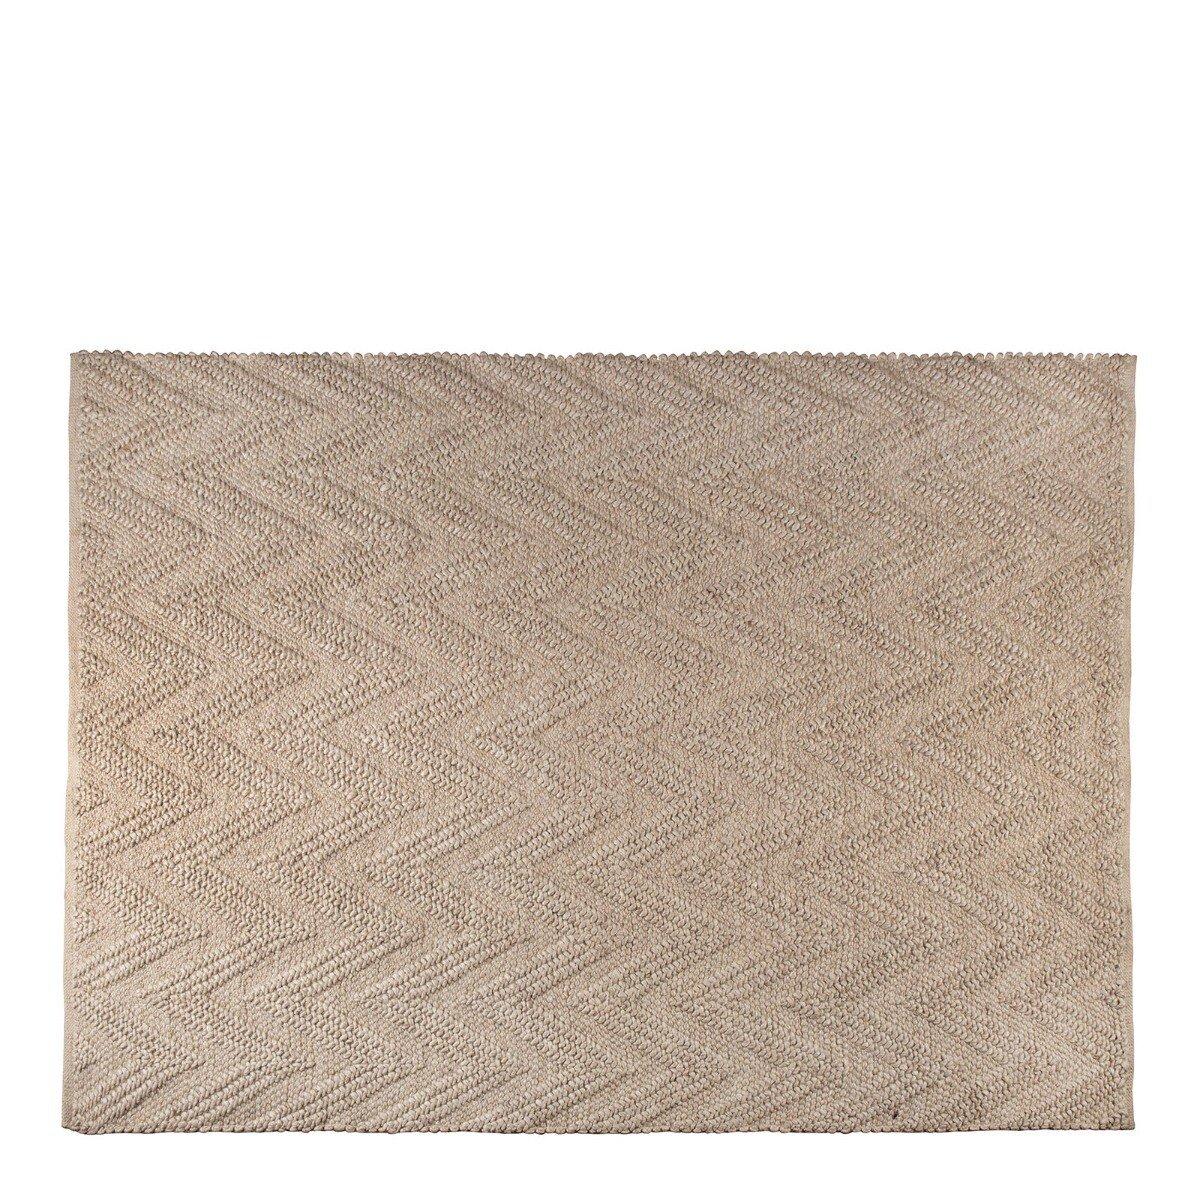 Zuiver Vloerkleed Punja Marled 170 x 240